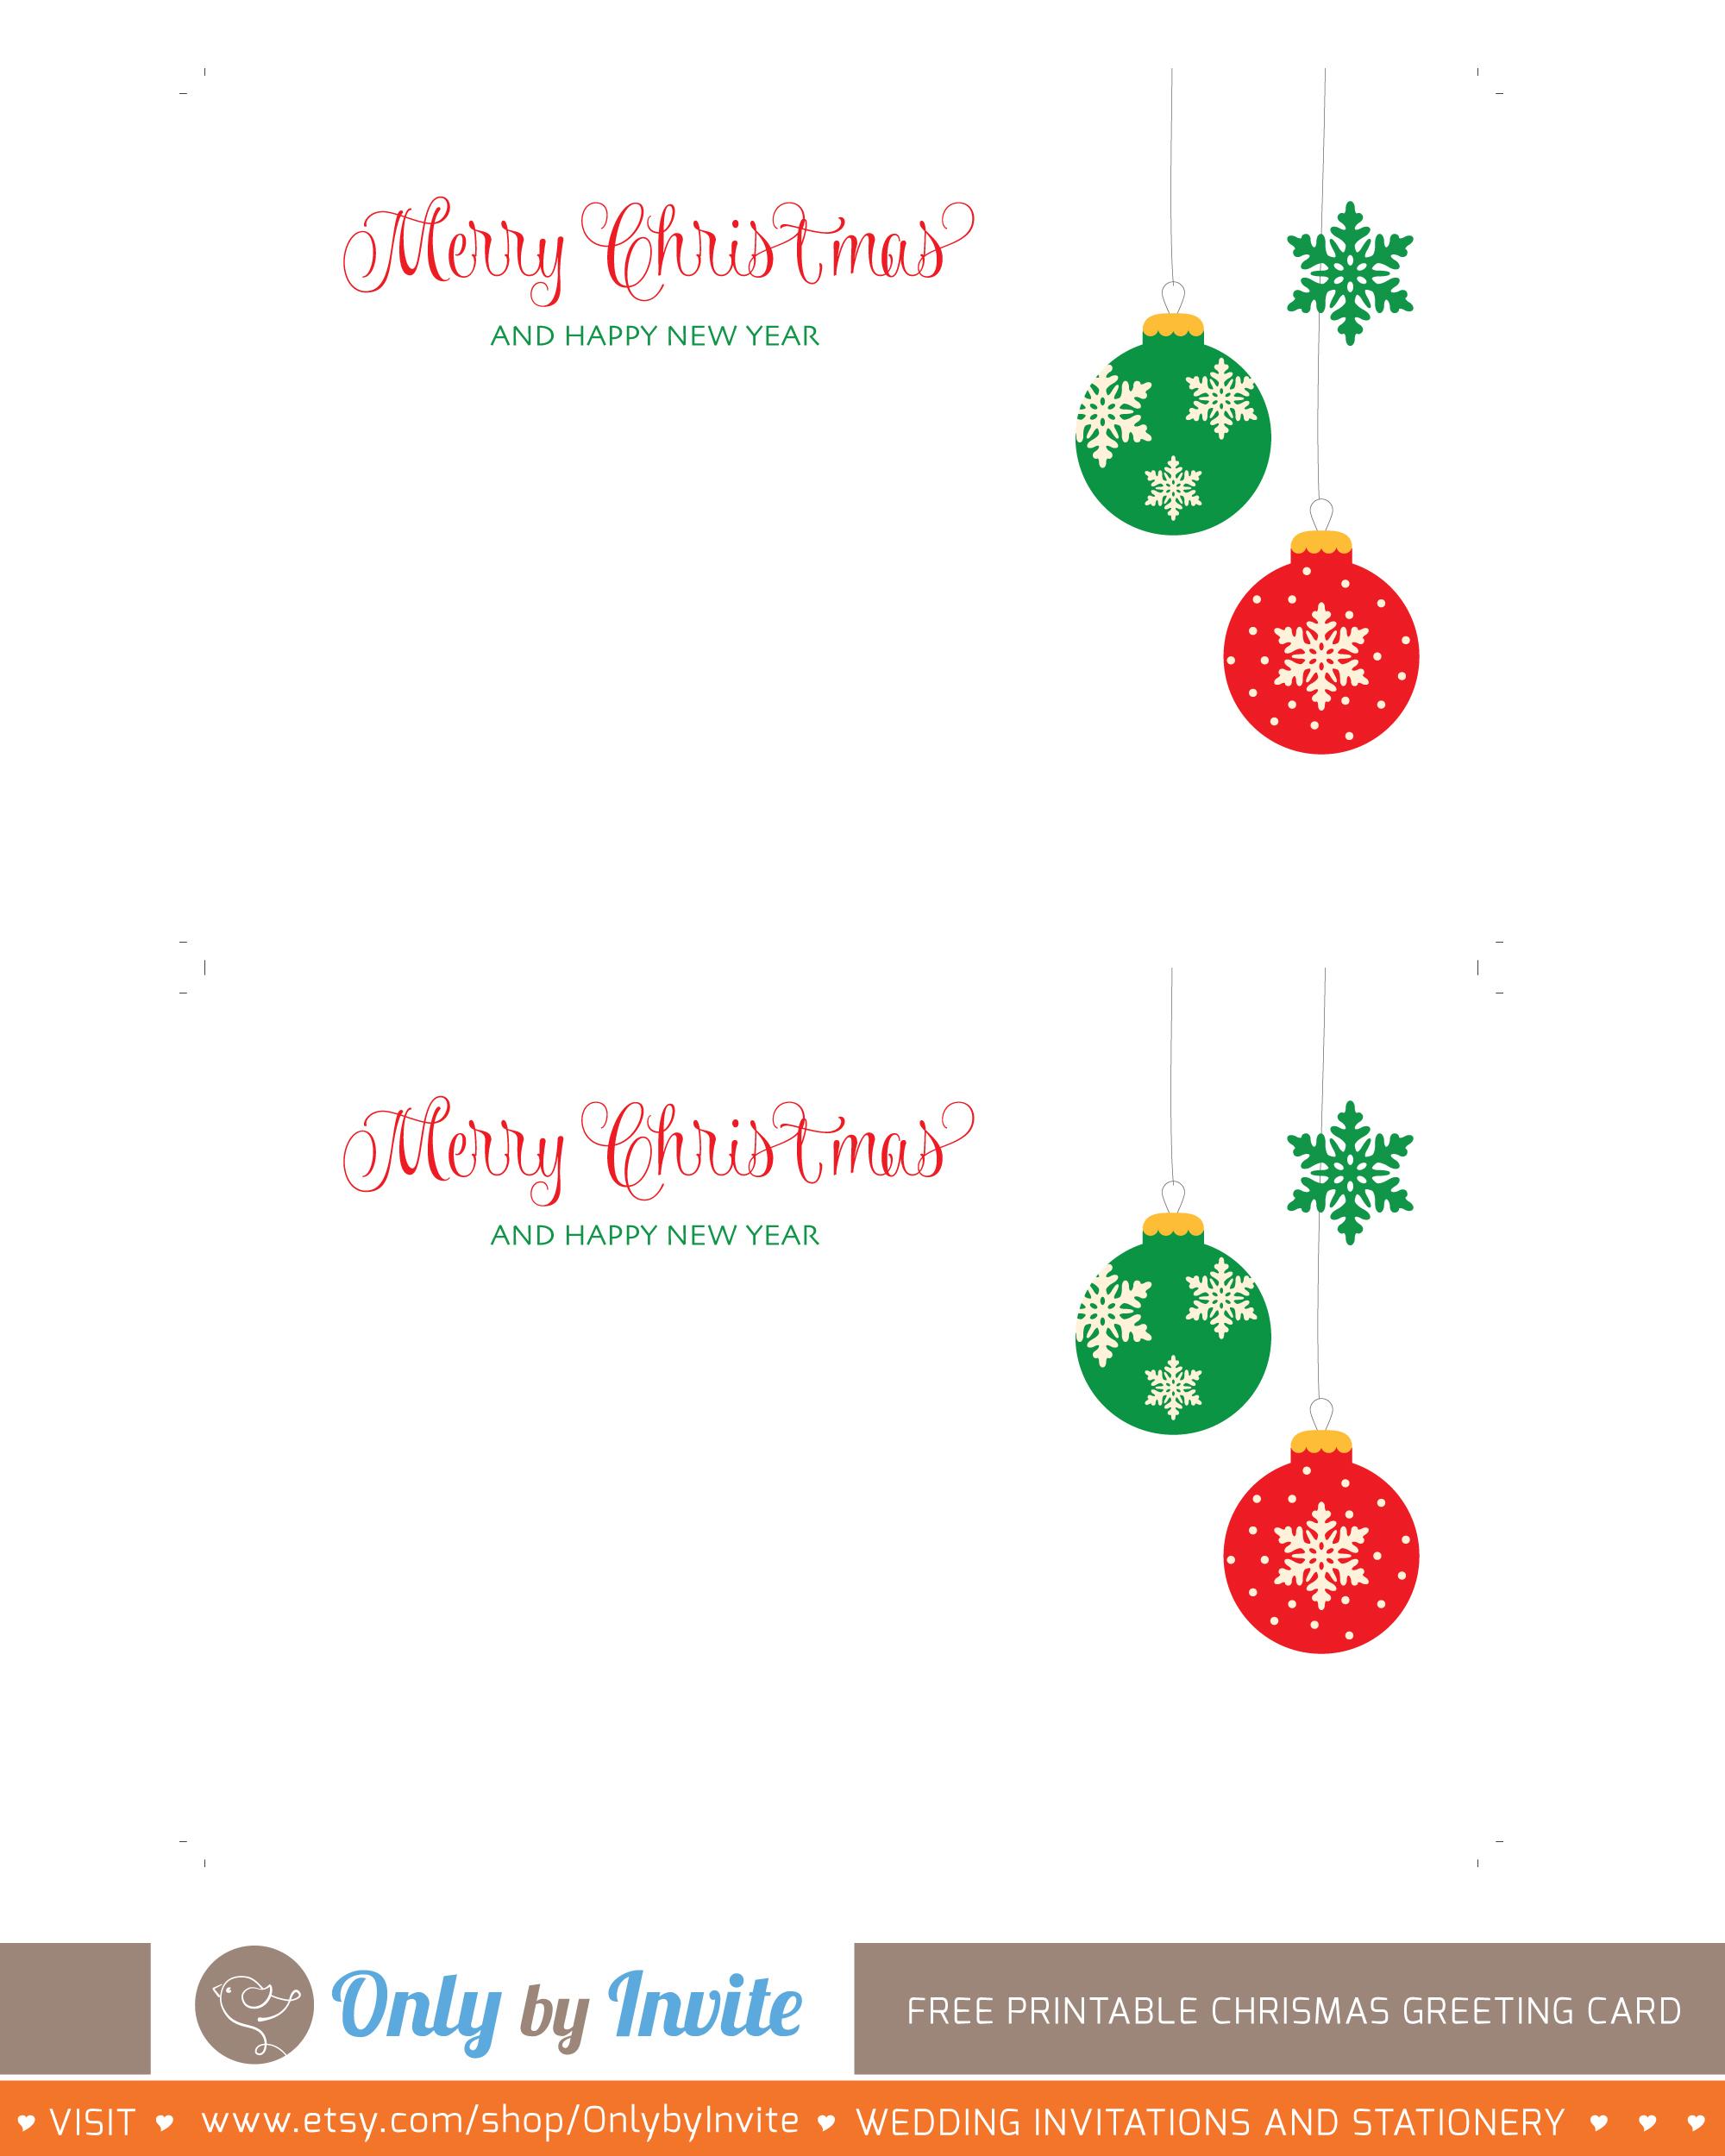 024 Free Printable Cards Template Ideas ~ Ulyssesroom - Free Printable Xmas Cards